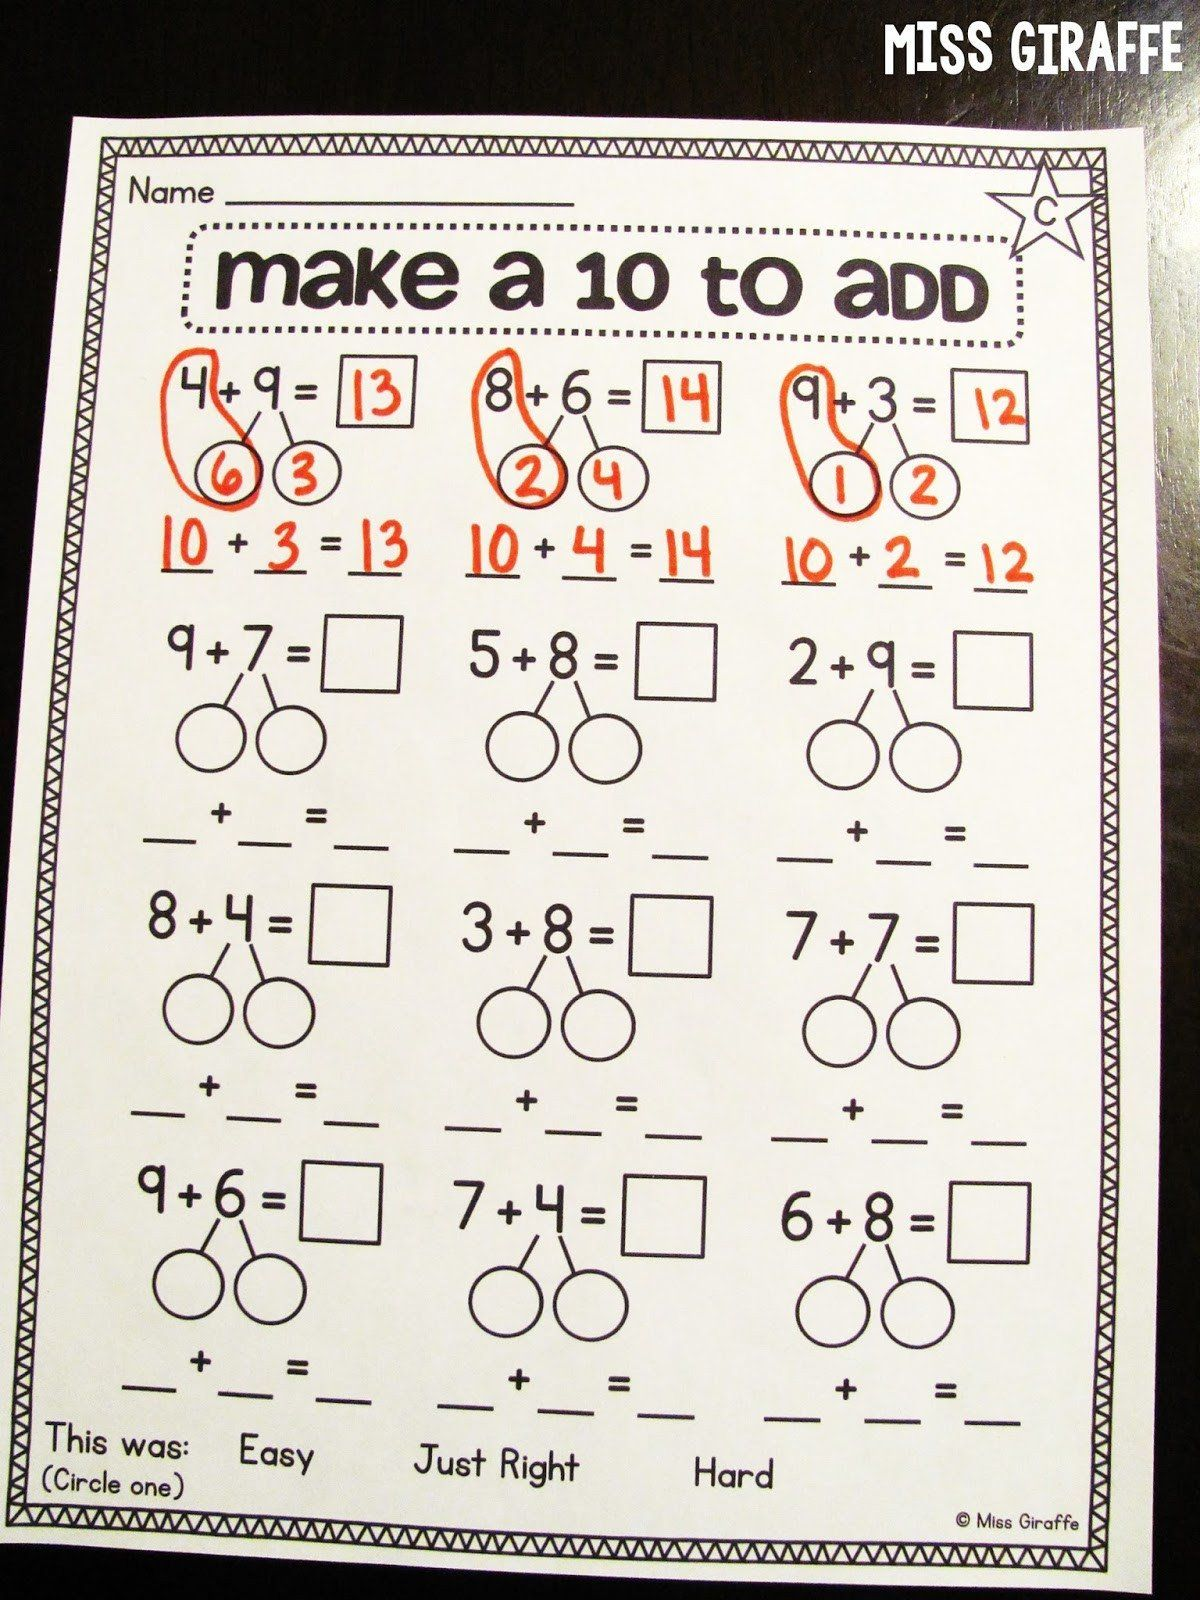 Decomposing Numbers Worksheet 3rd Grade Miss Giraffe S